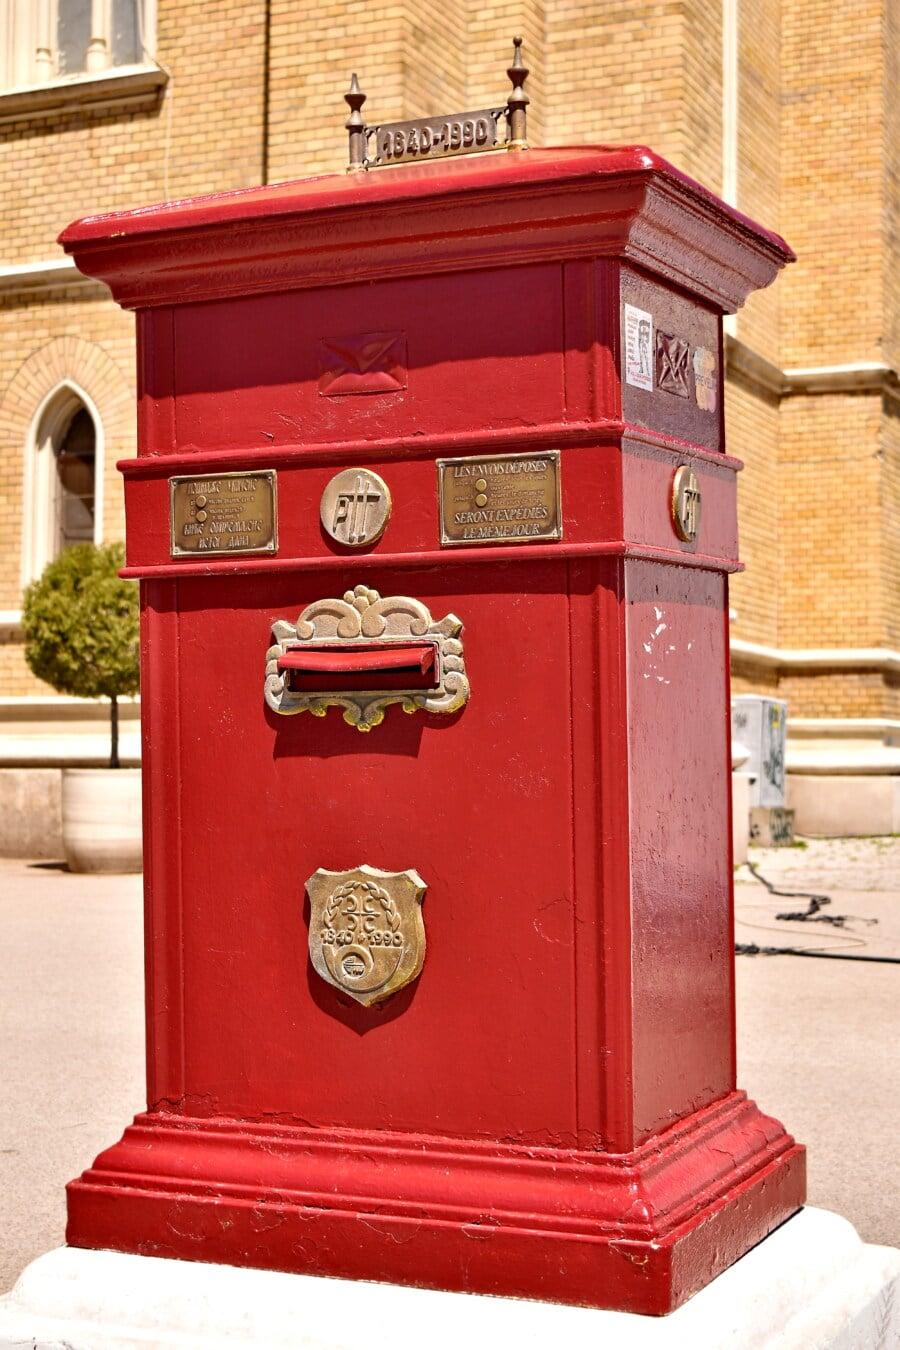 postboks, gammeldags, gate, rød, støpejern, jern, messing, boksen, arkitektur, antikk